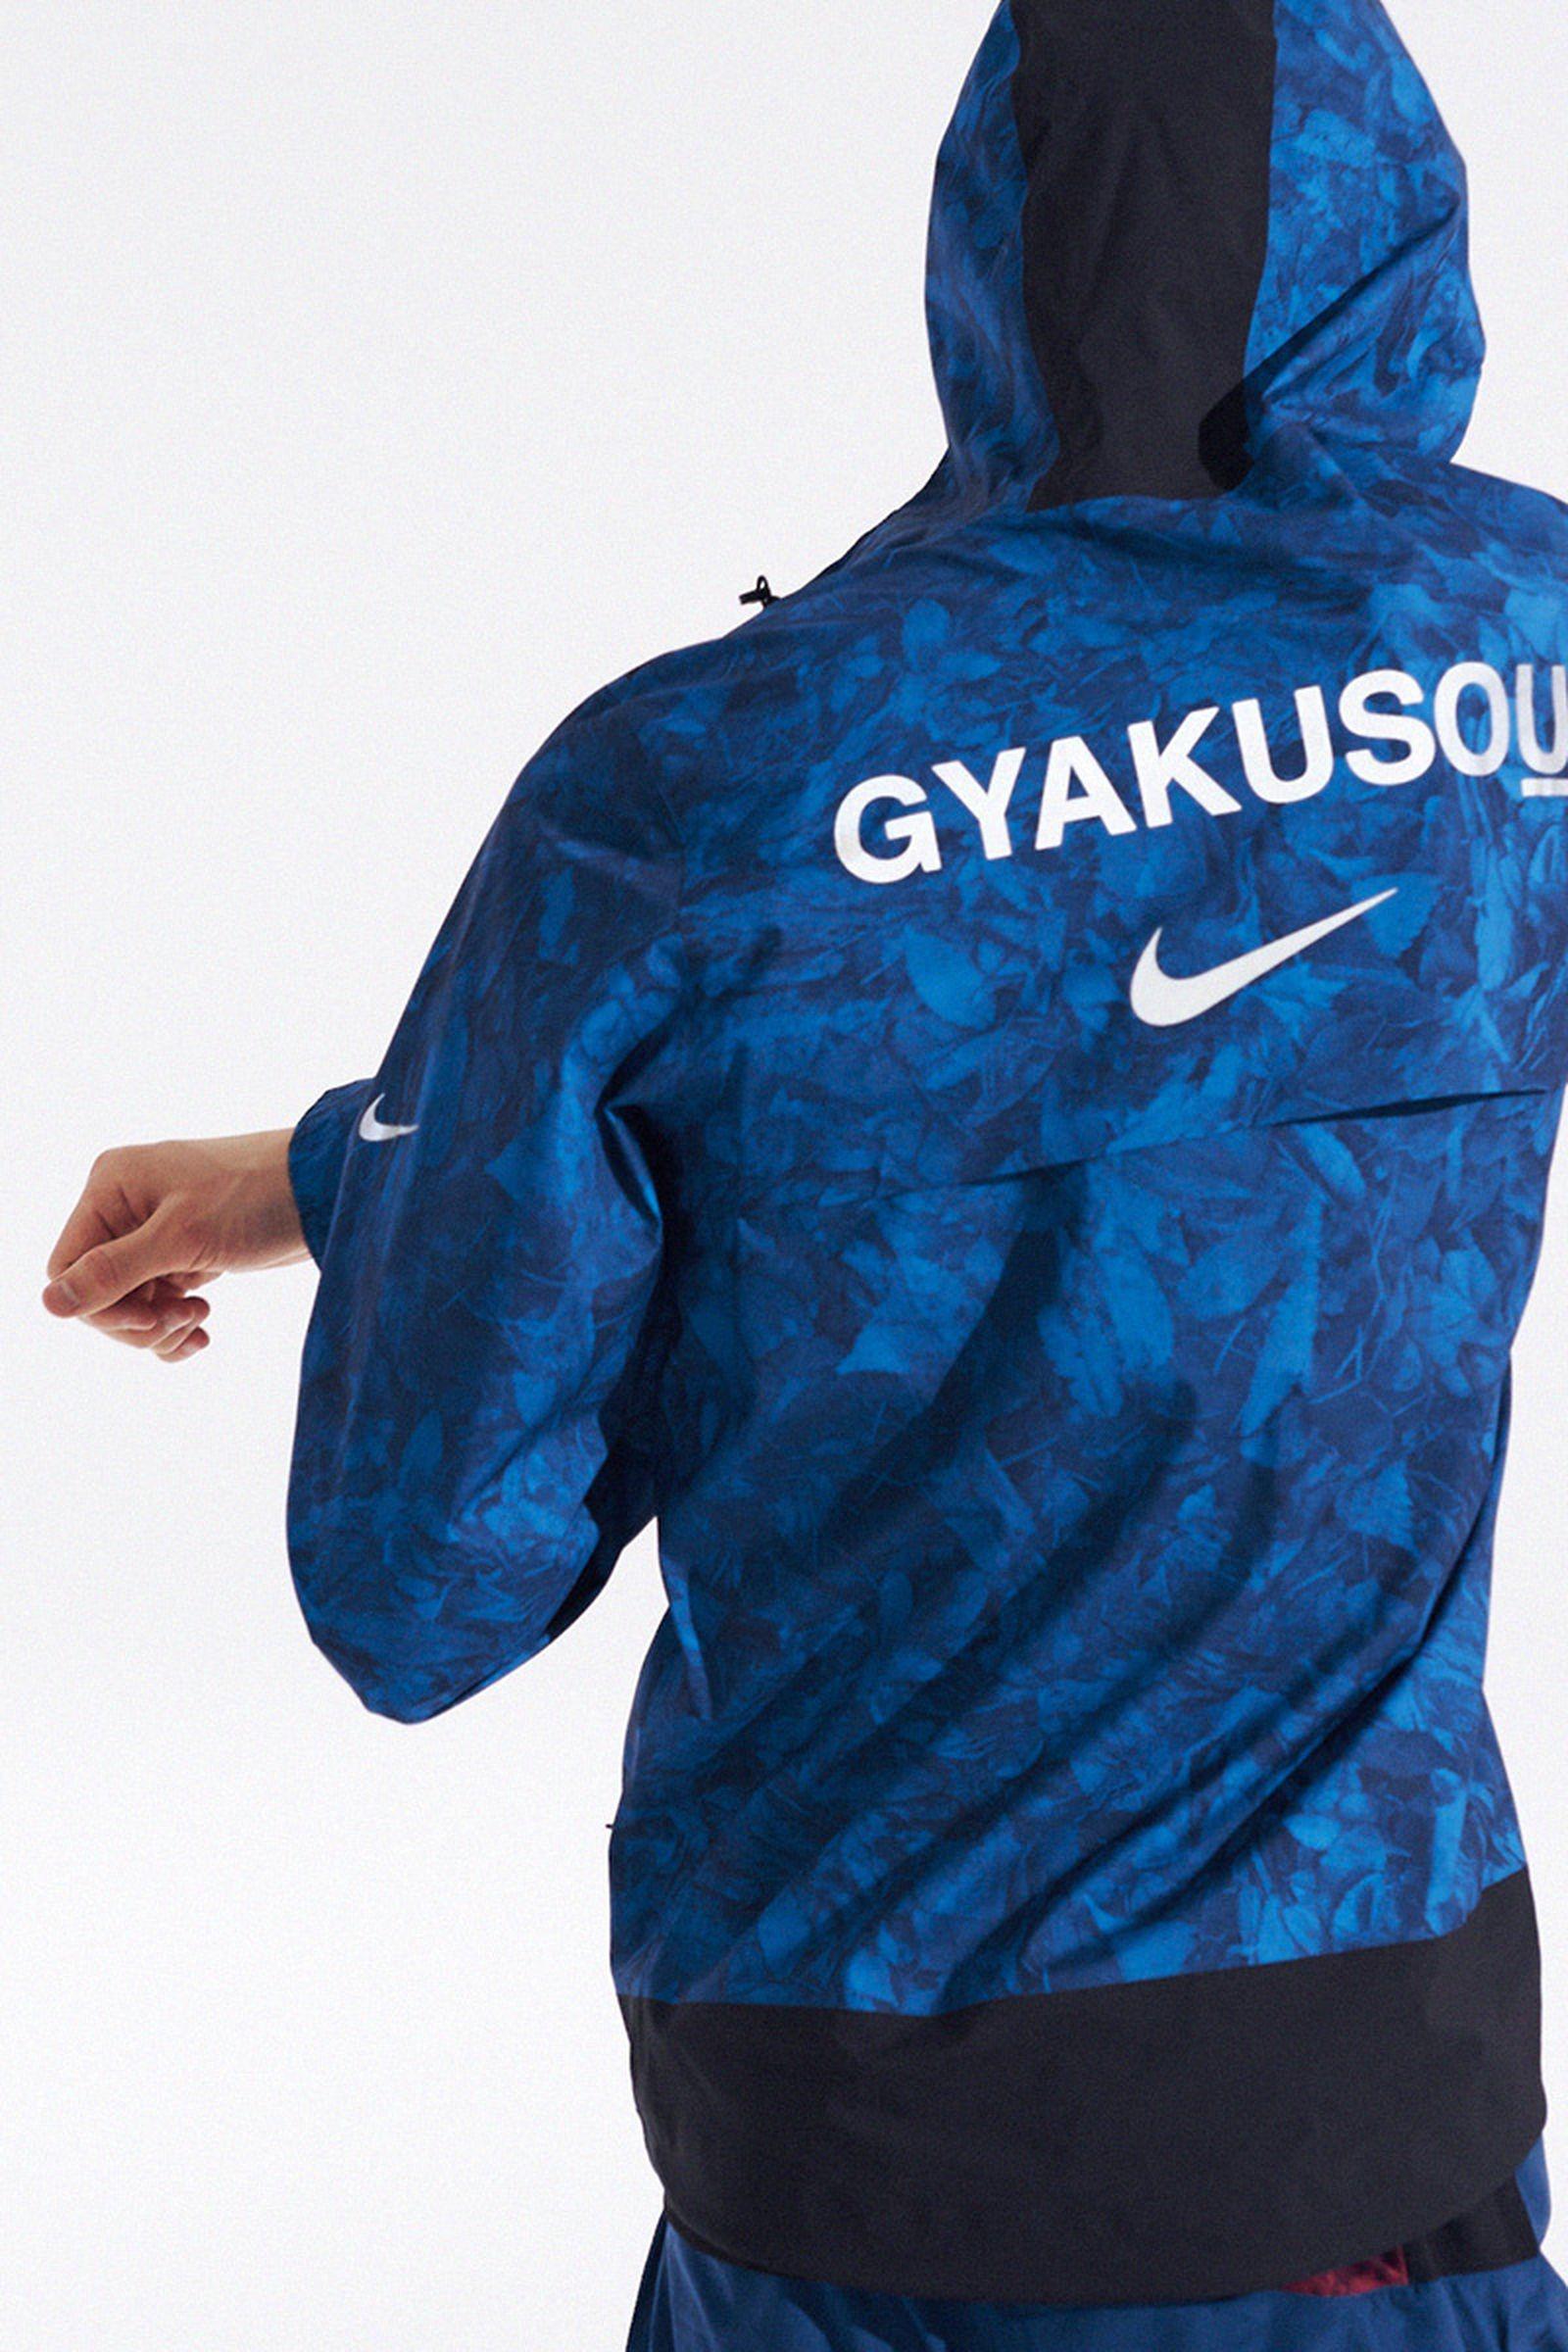 athleisure brands 1017 ALYX 9SM AENCE BRANDBLACK